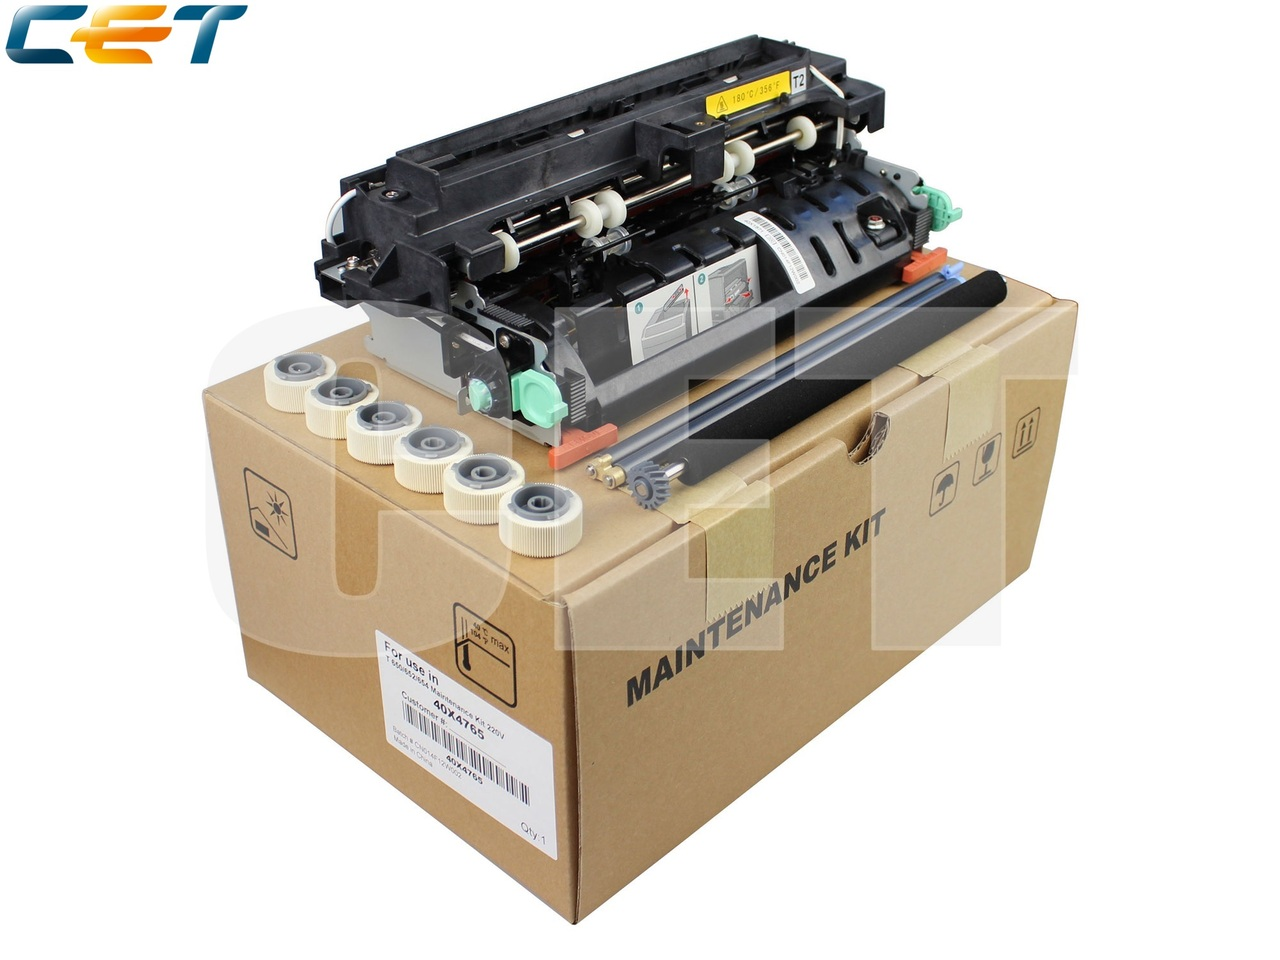 Ремонтный комплект 40X4765, 40X4768 для LEXMARKT650/T652/T654/X651/X652/X654/X656/X658 (CET), CET5887